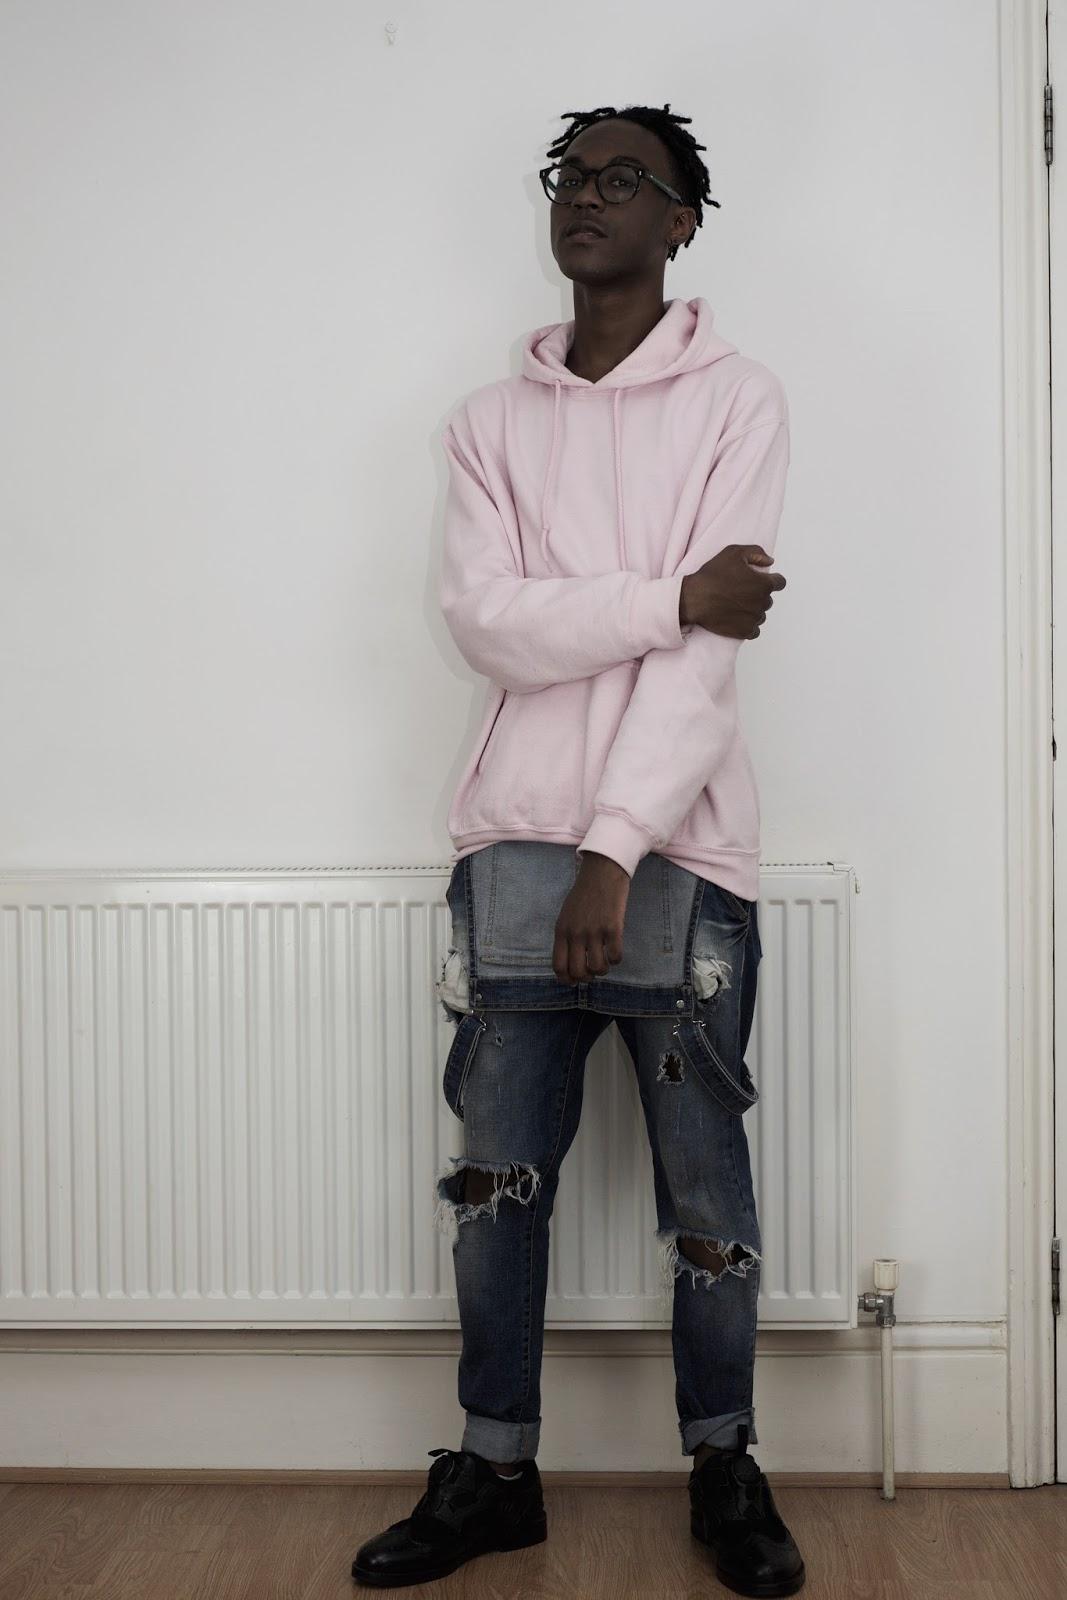 fashion, gay fashion, black gay, gay boy, Puma, hoodie, zara, ripped denim, sneakers, casual clothes, pink jumper, black, ootd, fashion blogger, menswear, mens fashion blogger